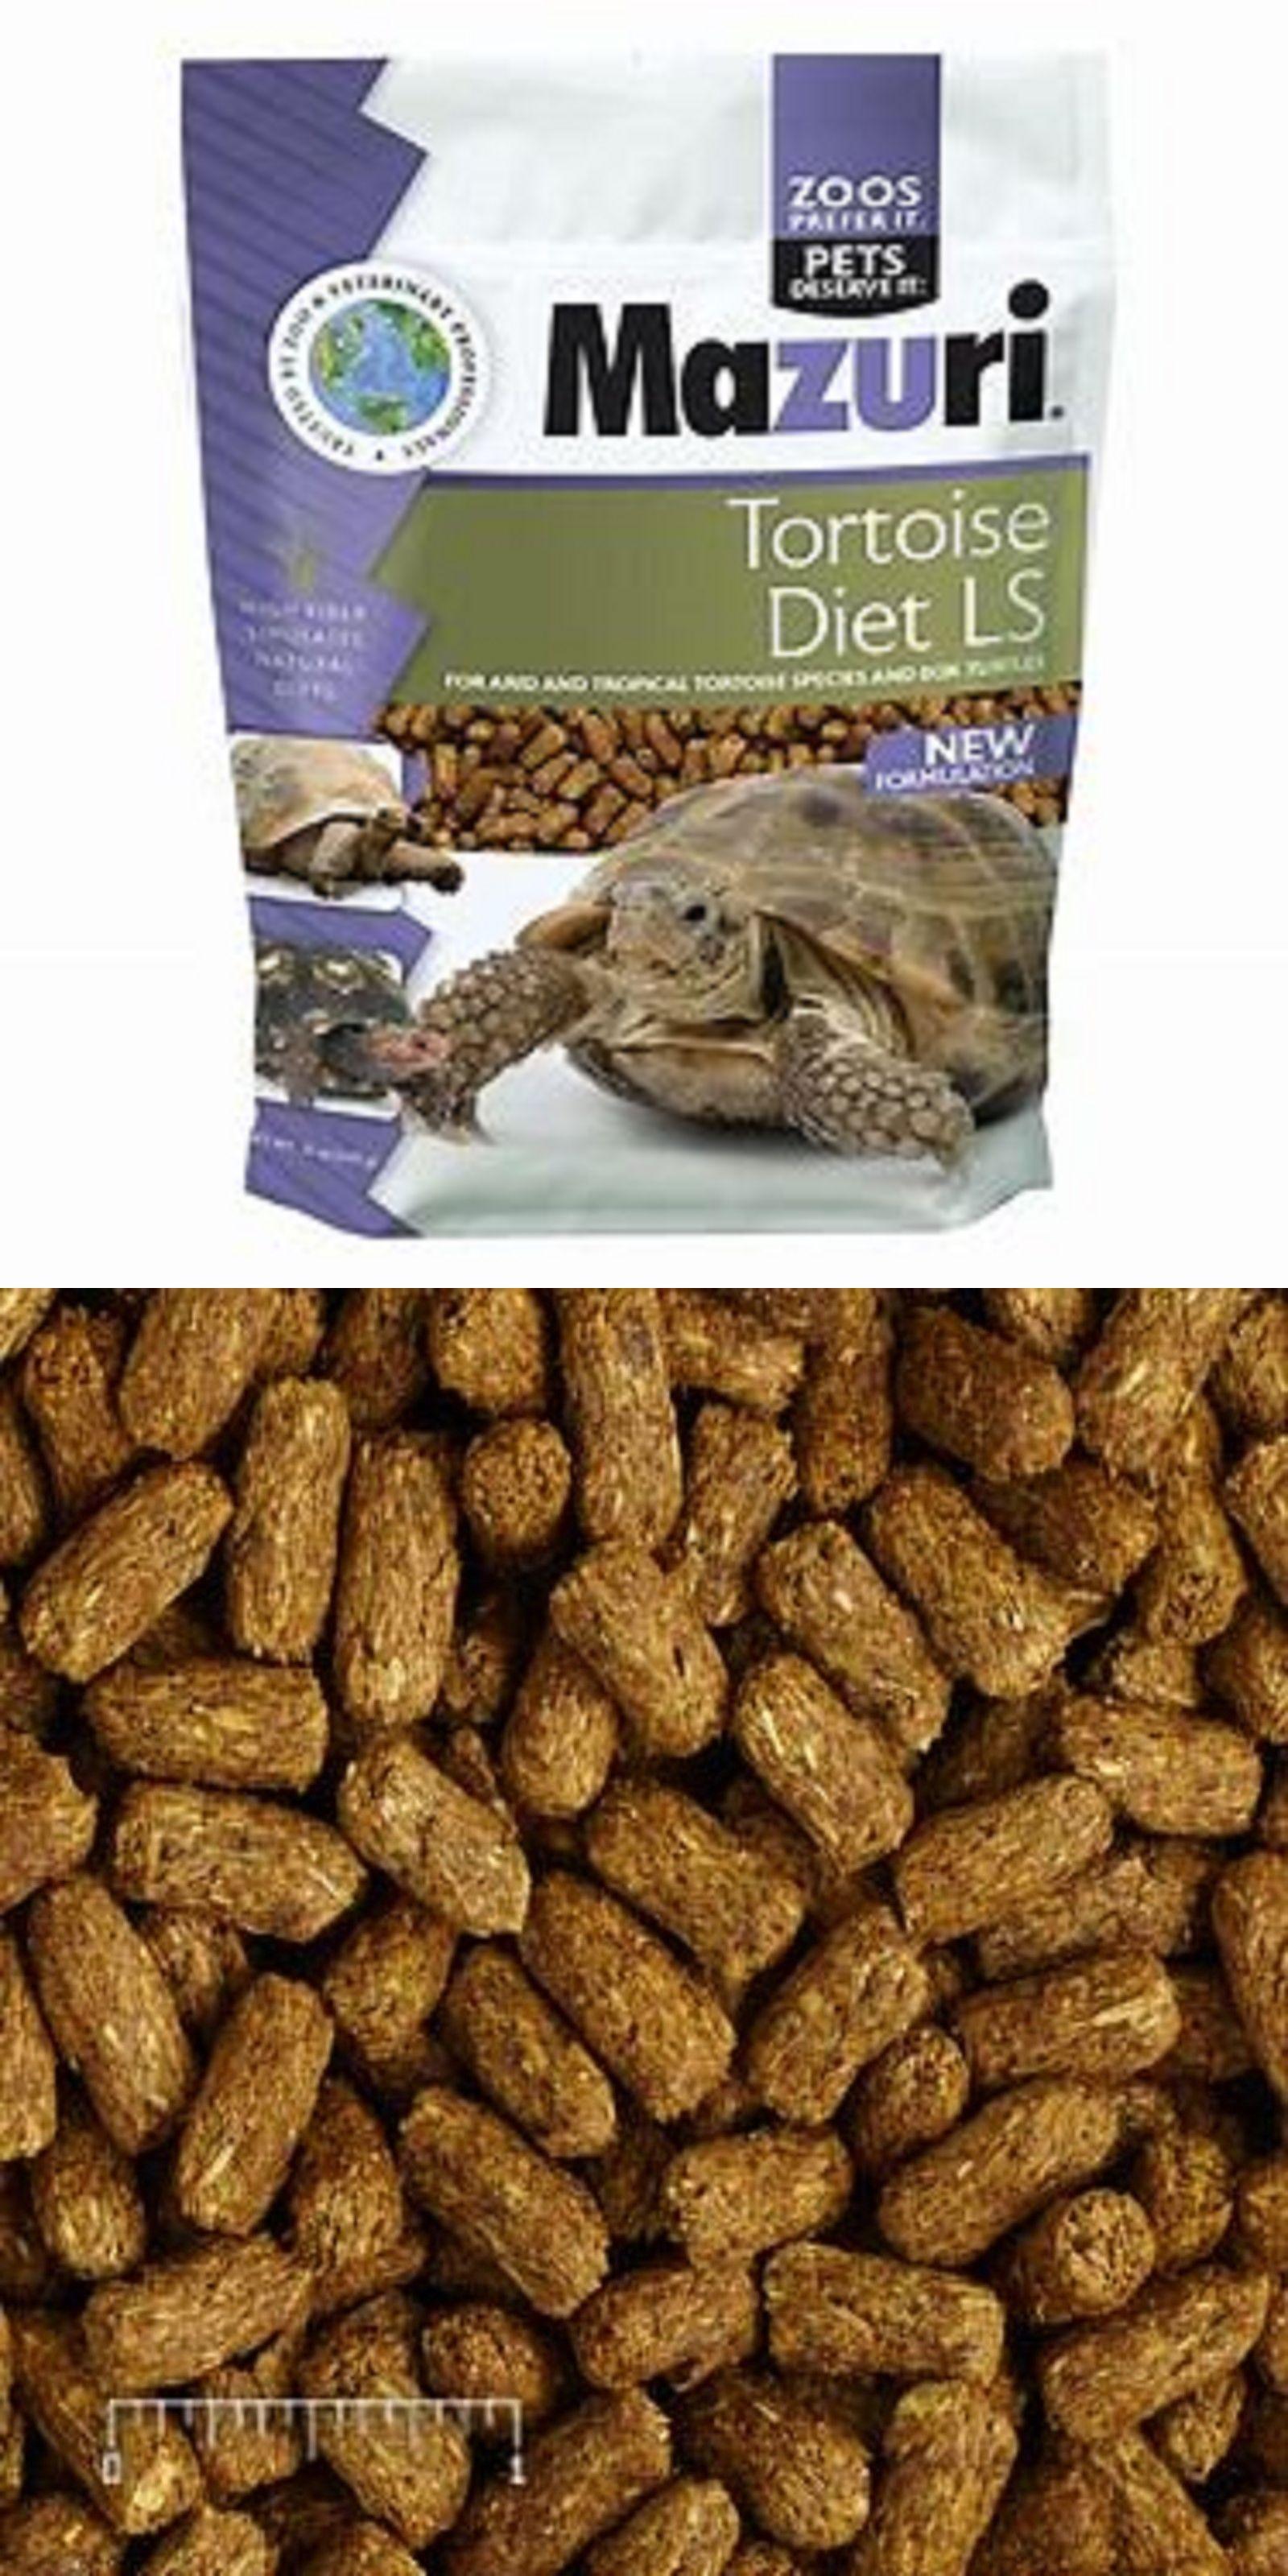 Food 20759 Mazuri Tortoise Box Turtle All Land Turtles 3 16 X 8 Pellets In Bulk It Now Only 15 99 On Ebay